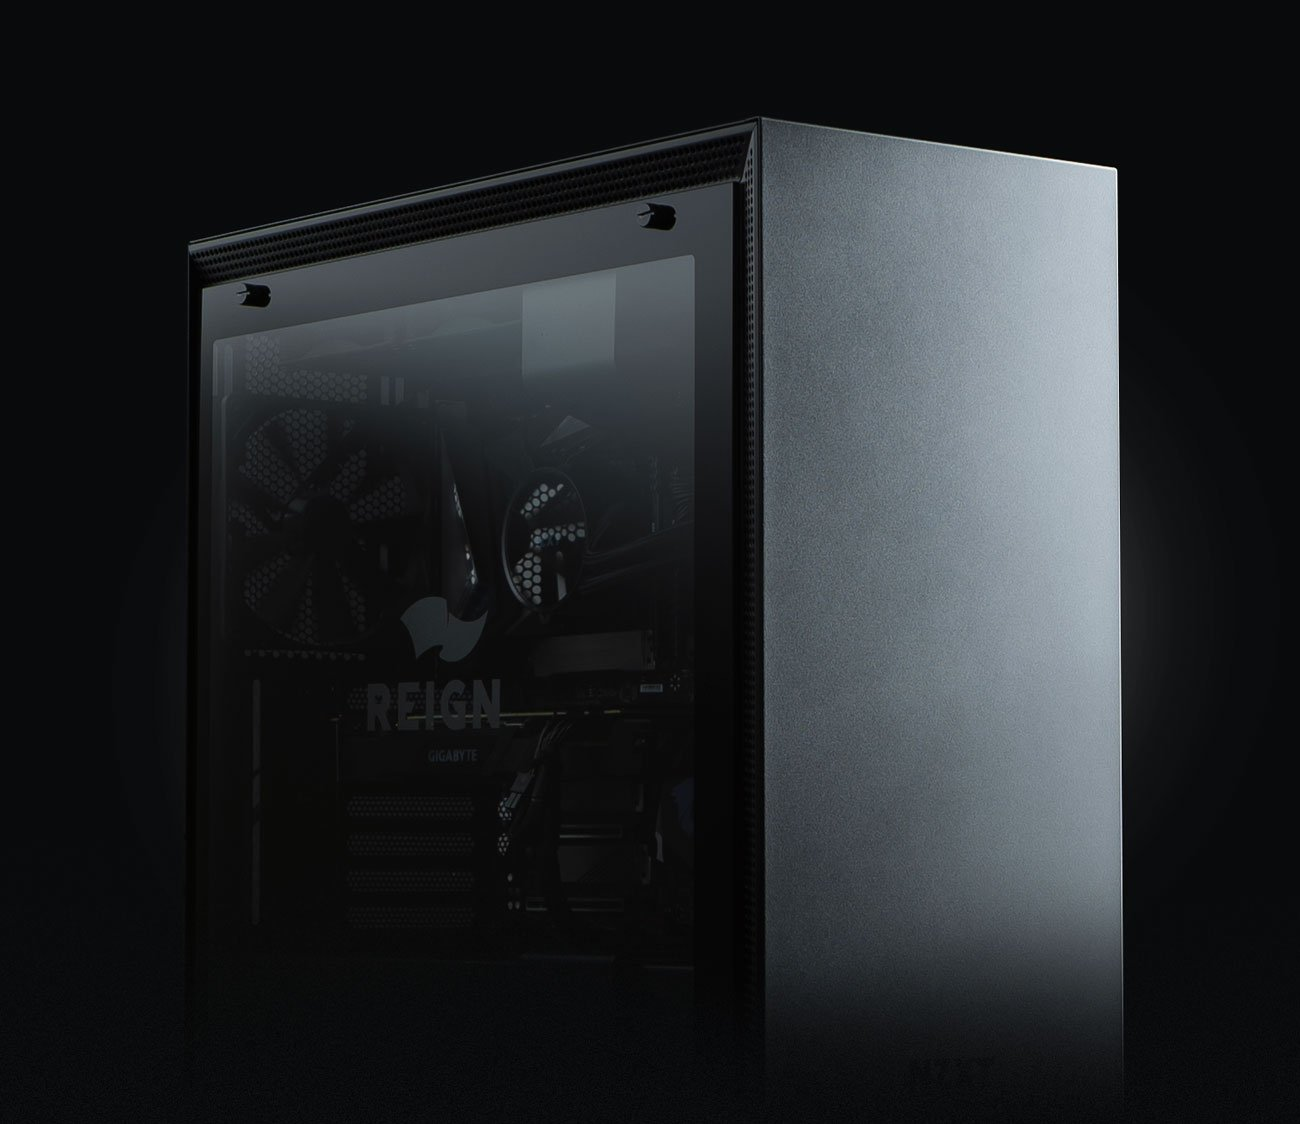 Gaming PCs - Reign Paladin Range of Gaming PCs